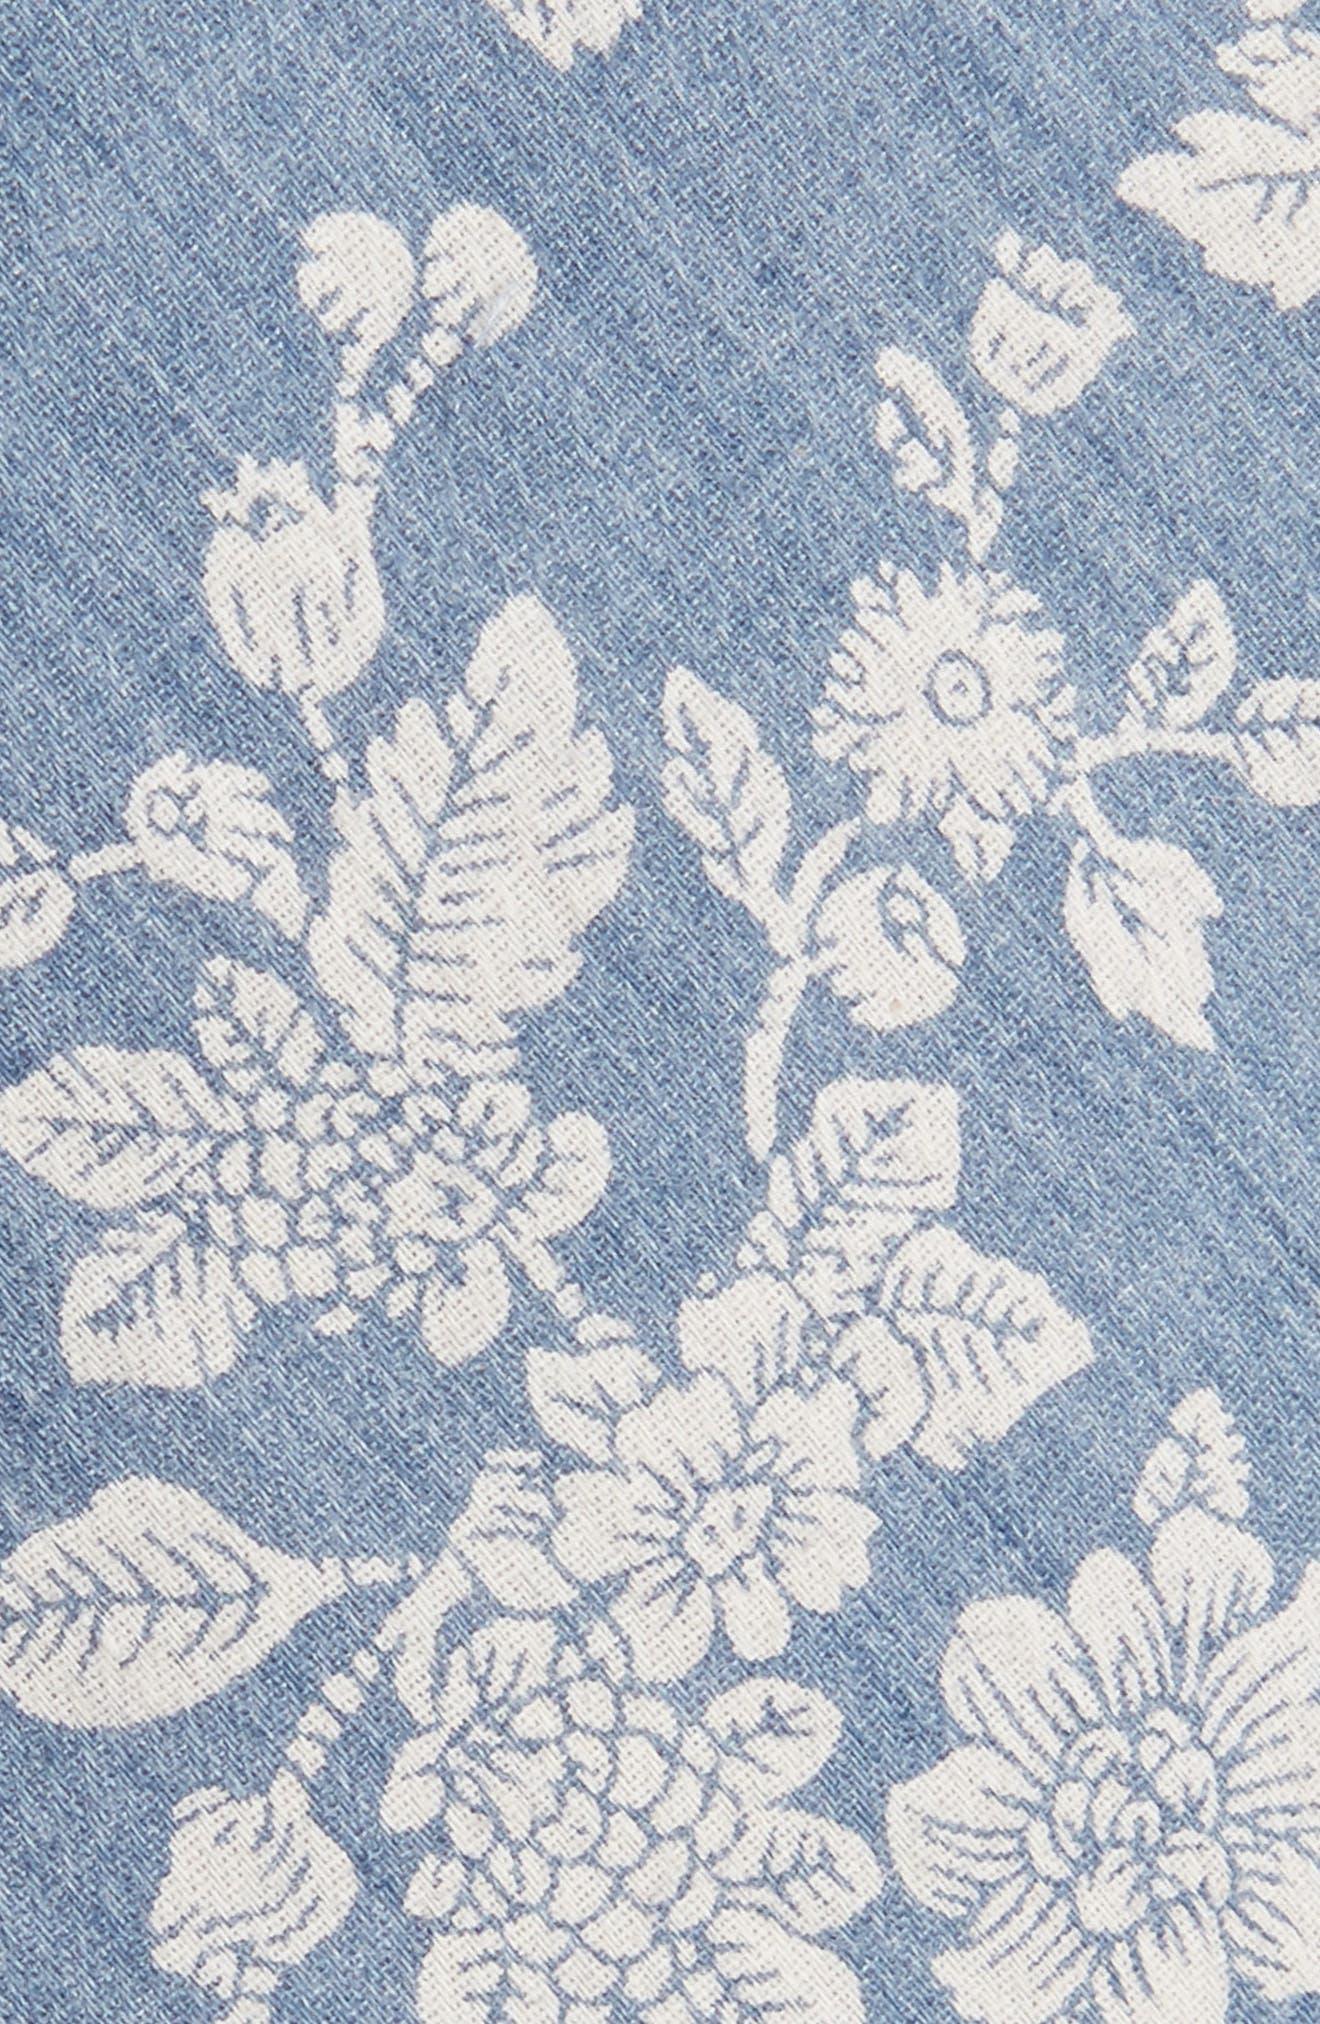 Floral Cotton Skinny Tie,                             Alternate thumbnail 2, color,                             401